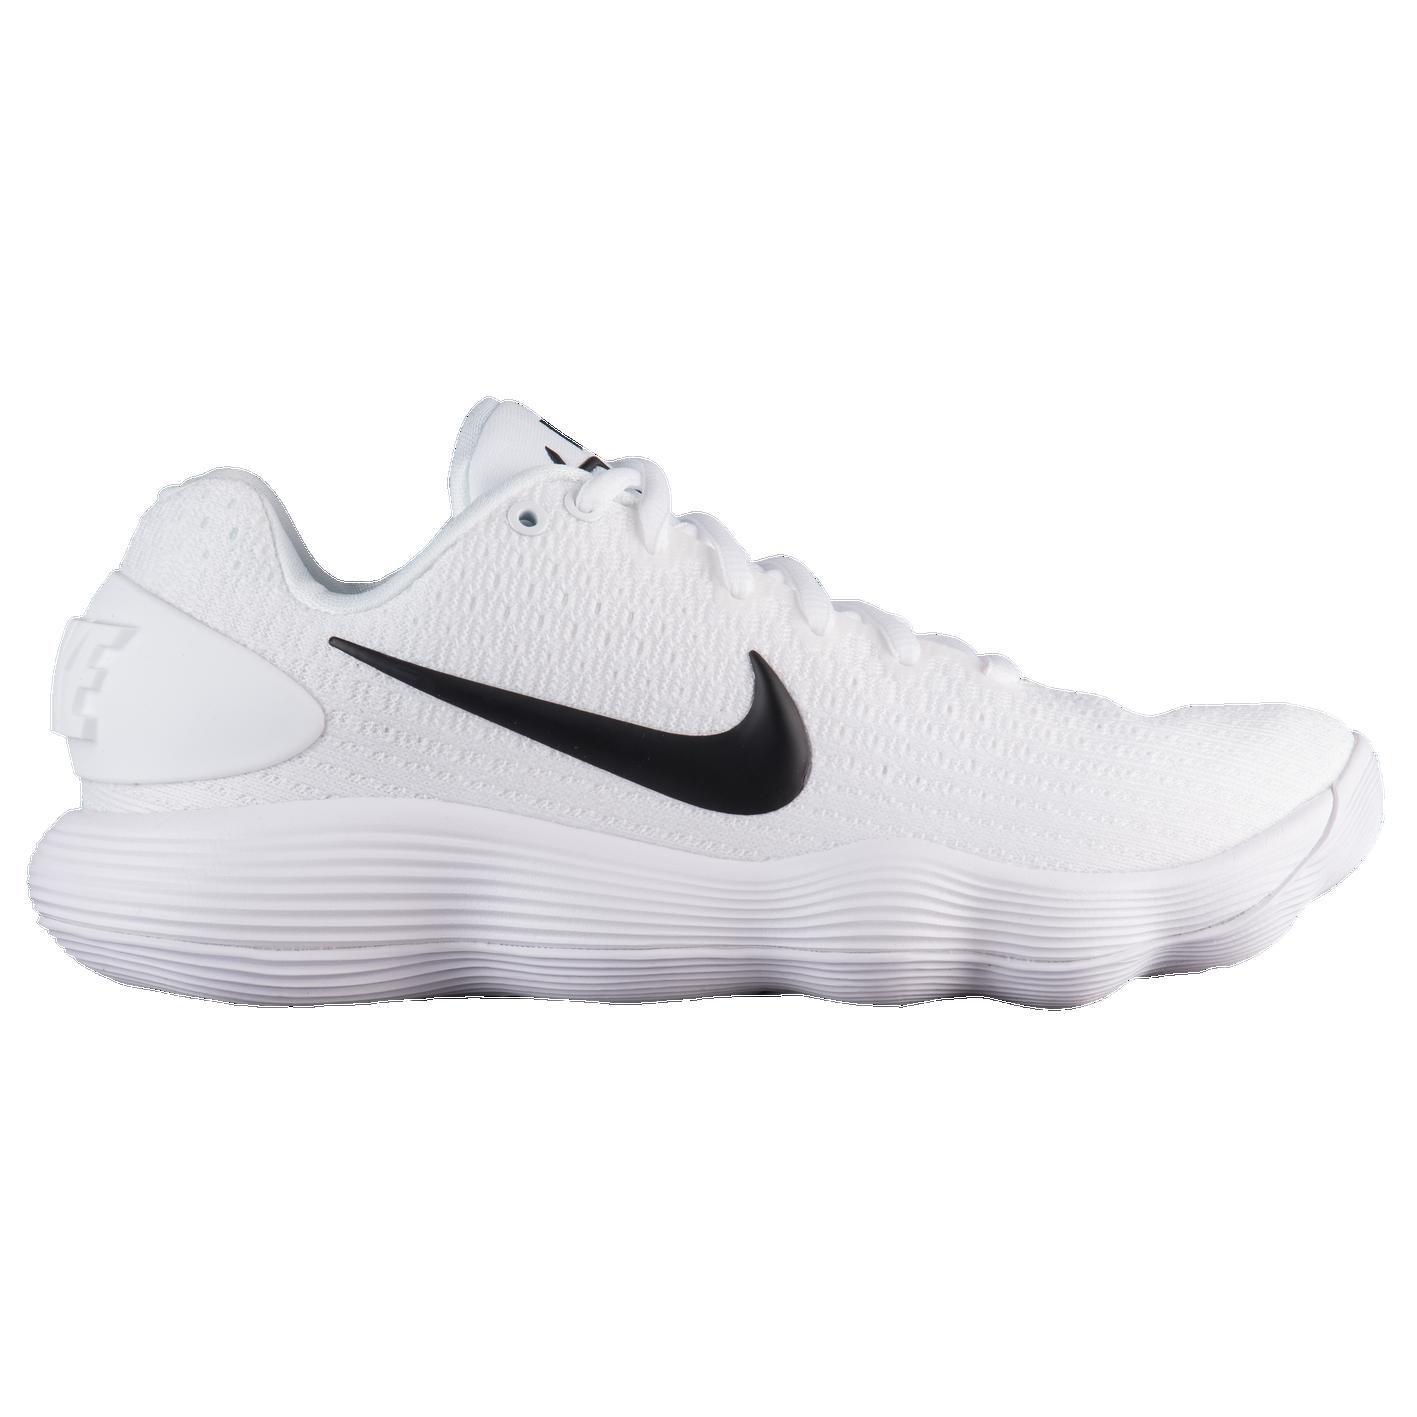 super popular 9652f 3fc63 Nike React Hyperdunk 2017 Low - Women's - Basketball - Shoes - White ...